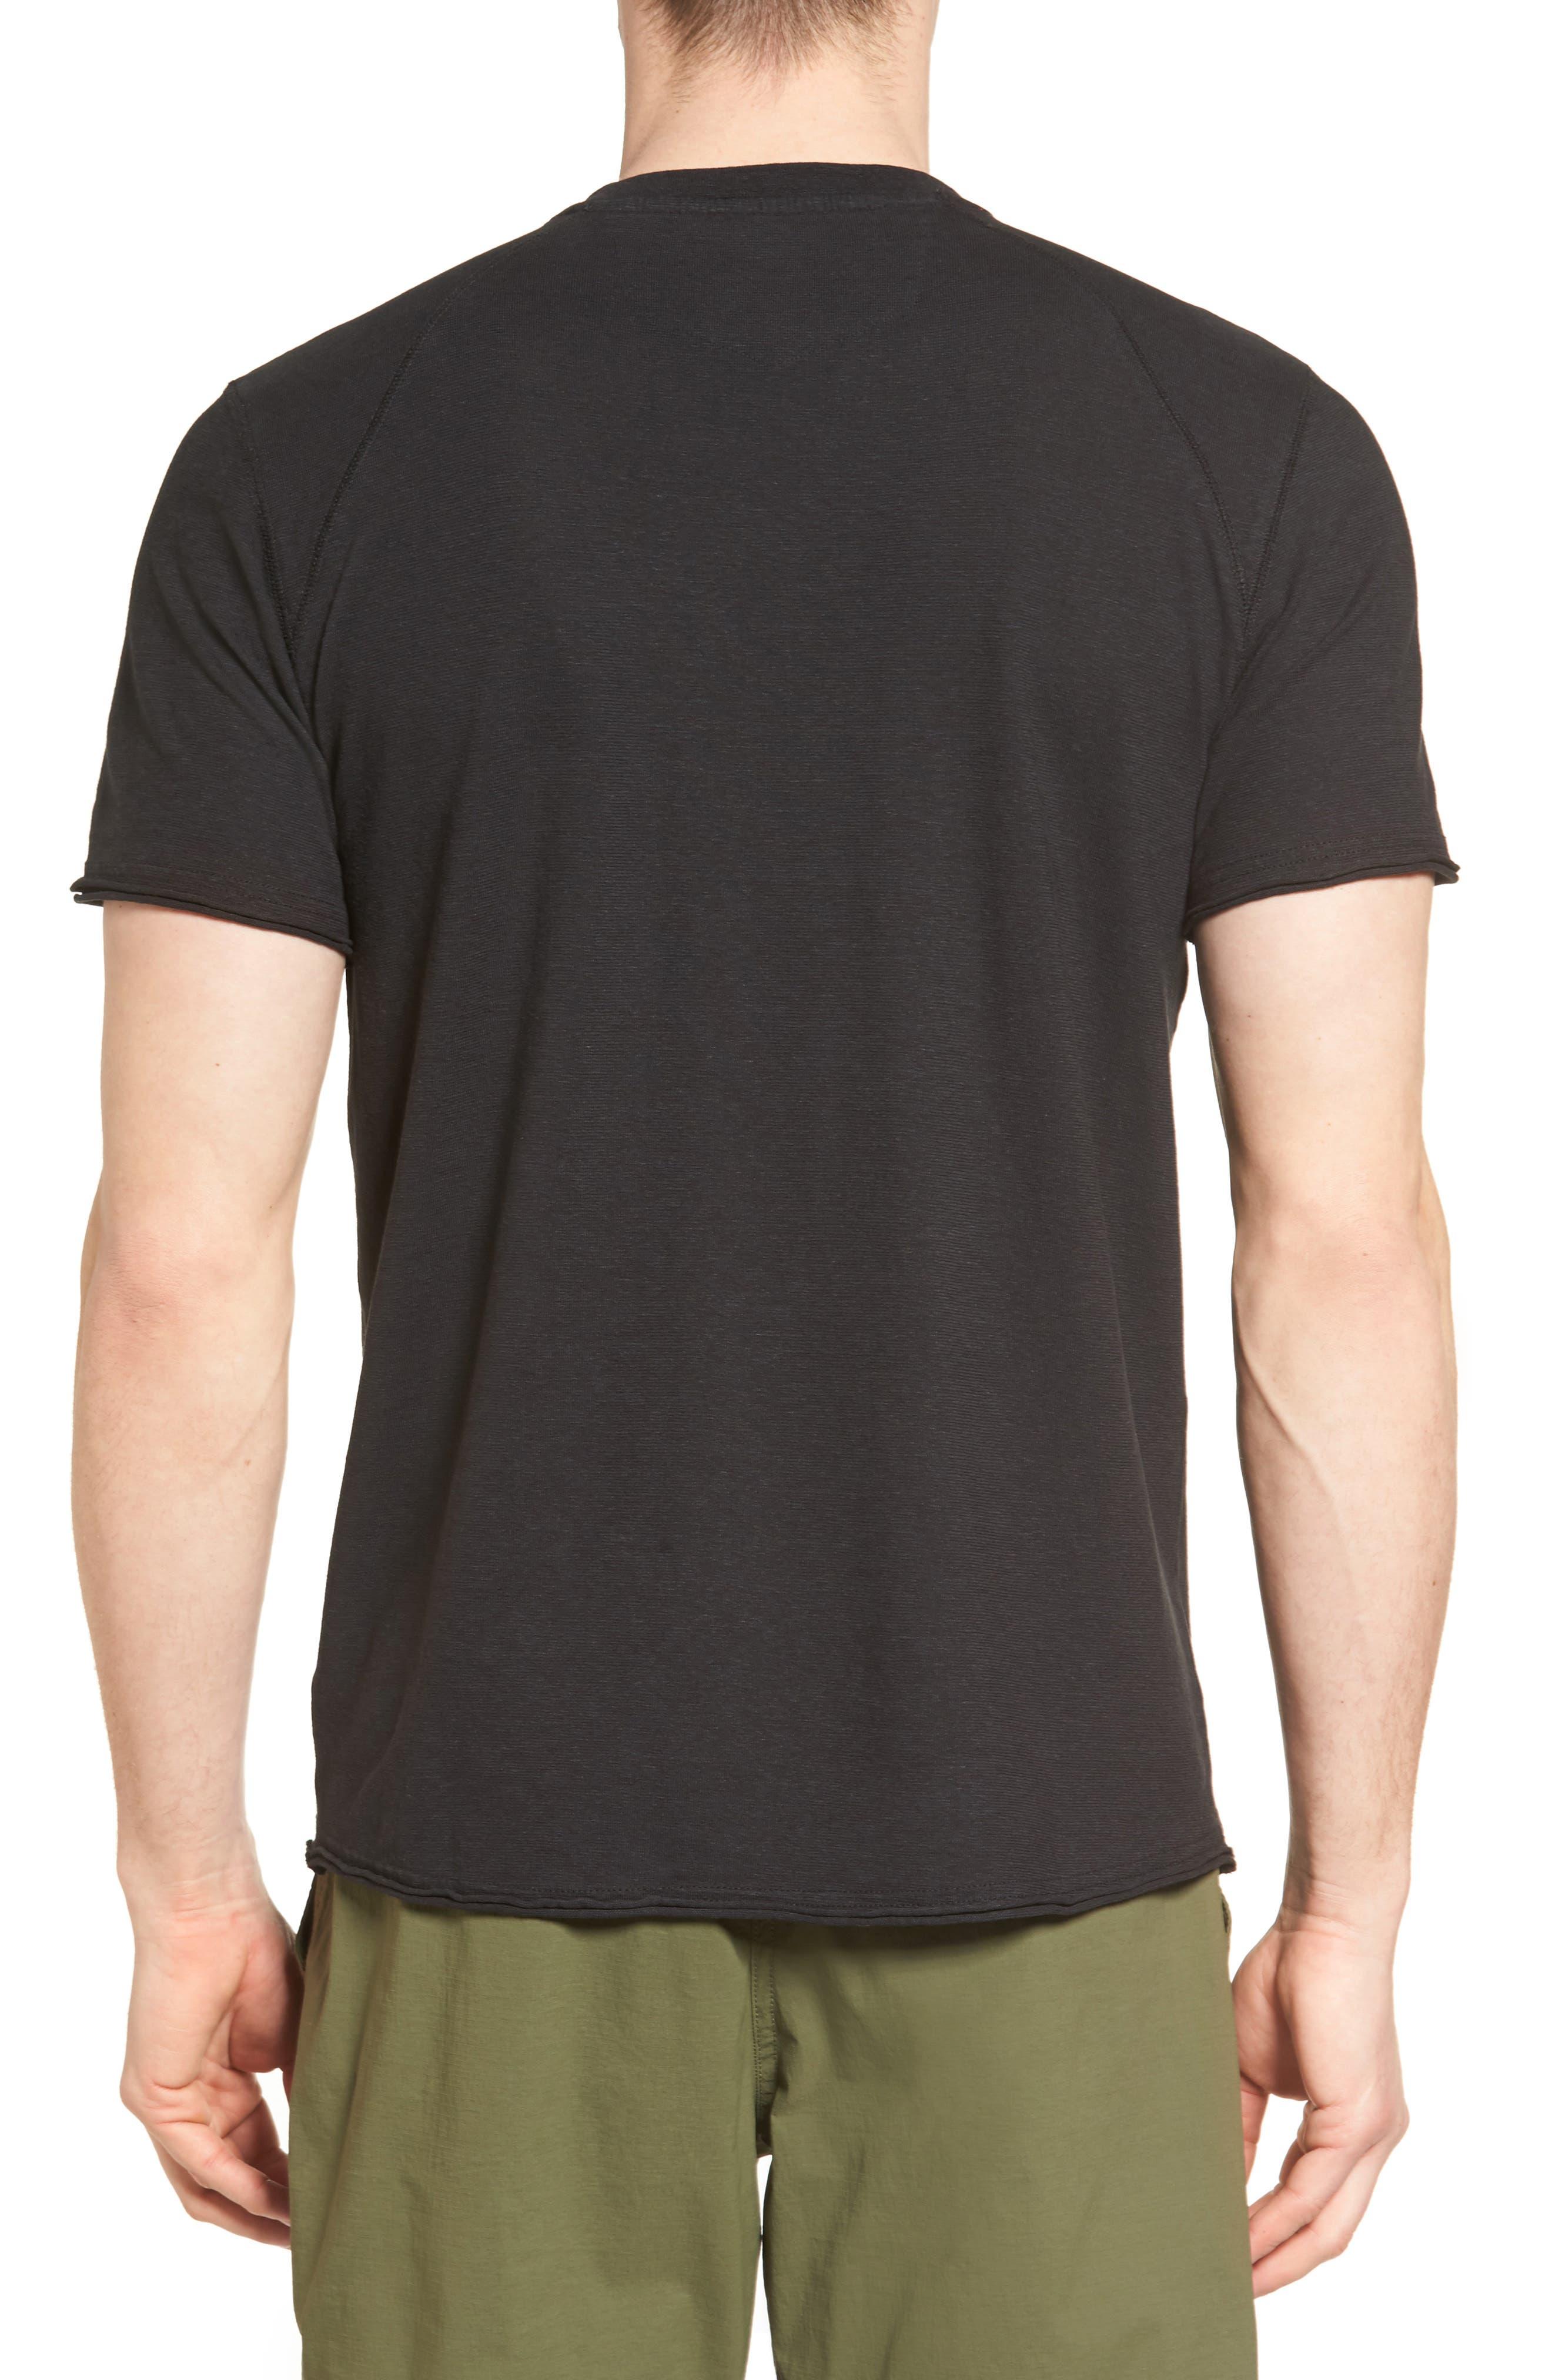 Camura T-Shirt,                             Alternate thumbnail 2, color,                             002